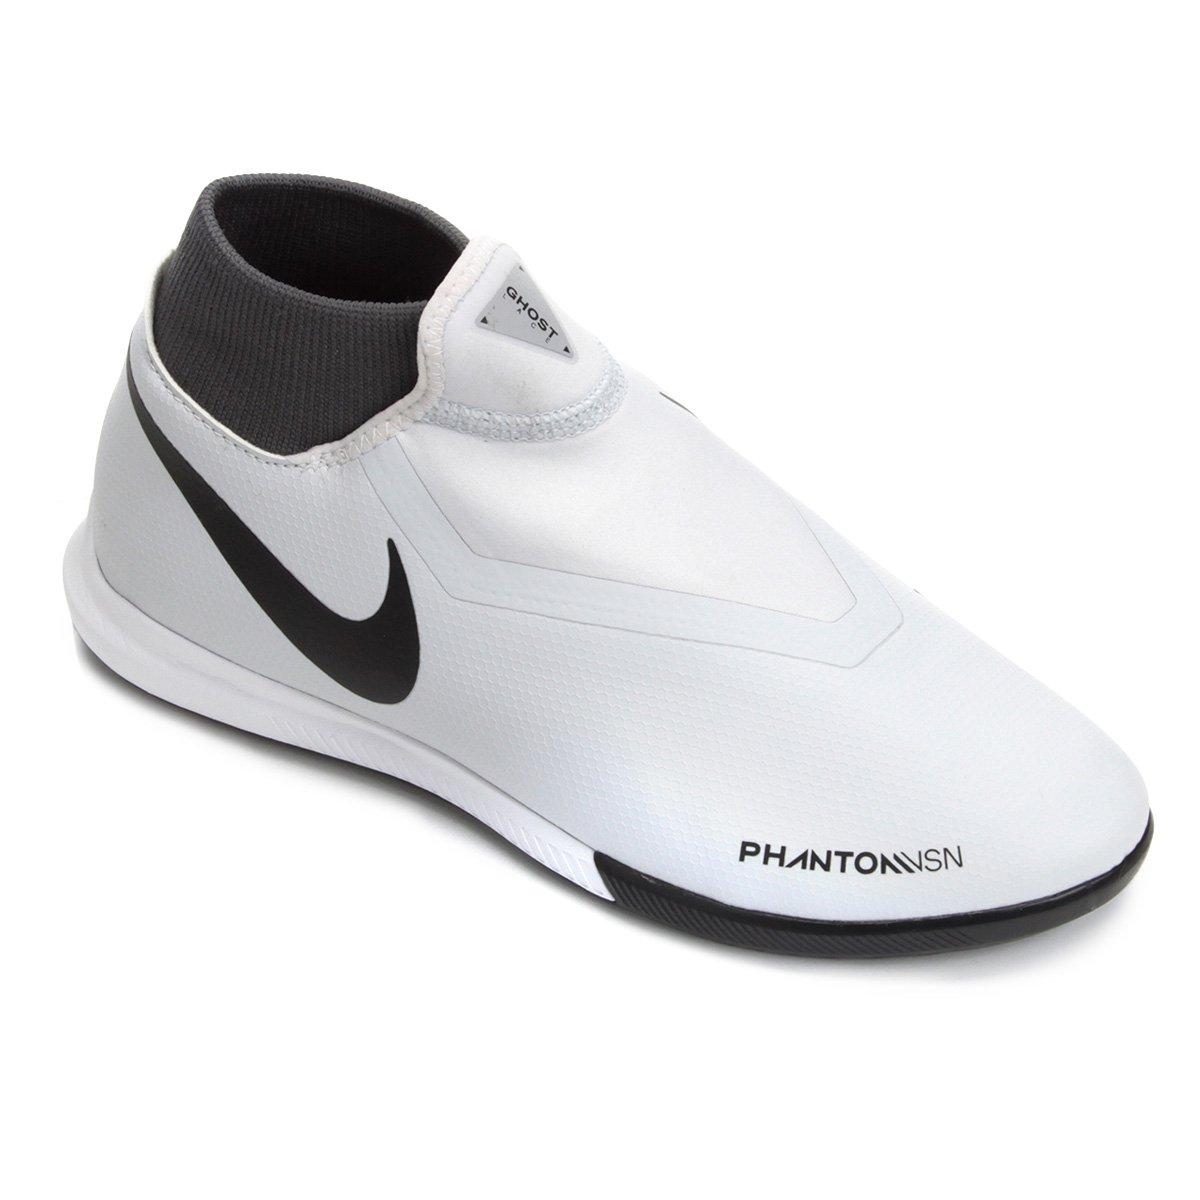 097232eb1a Chuteira Futsal Nike Phantom Vision Academy DF IC